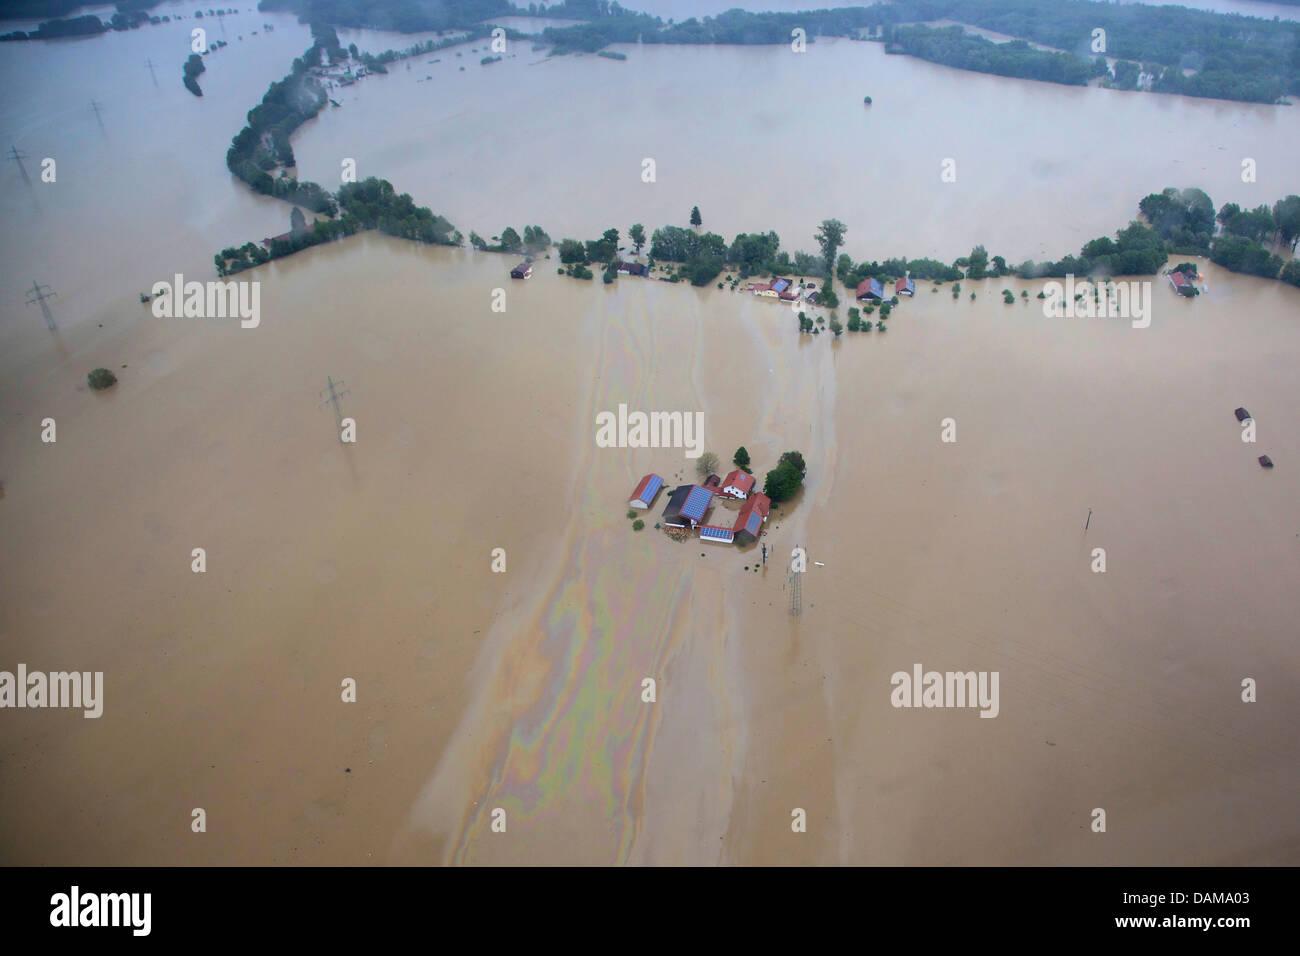 farmhouses and large oil layer on river Inn during the flood in June 2013, Germany, Bavaria, Schaerding - Stock Image